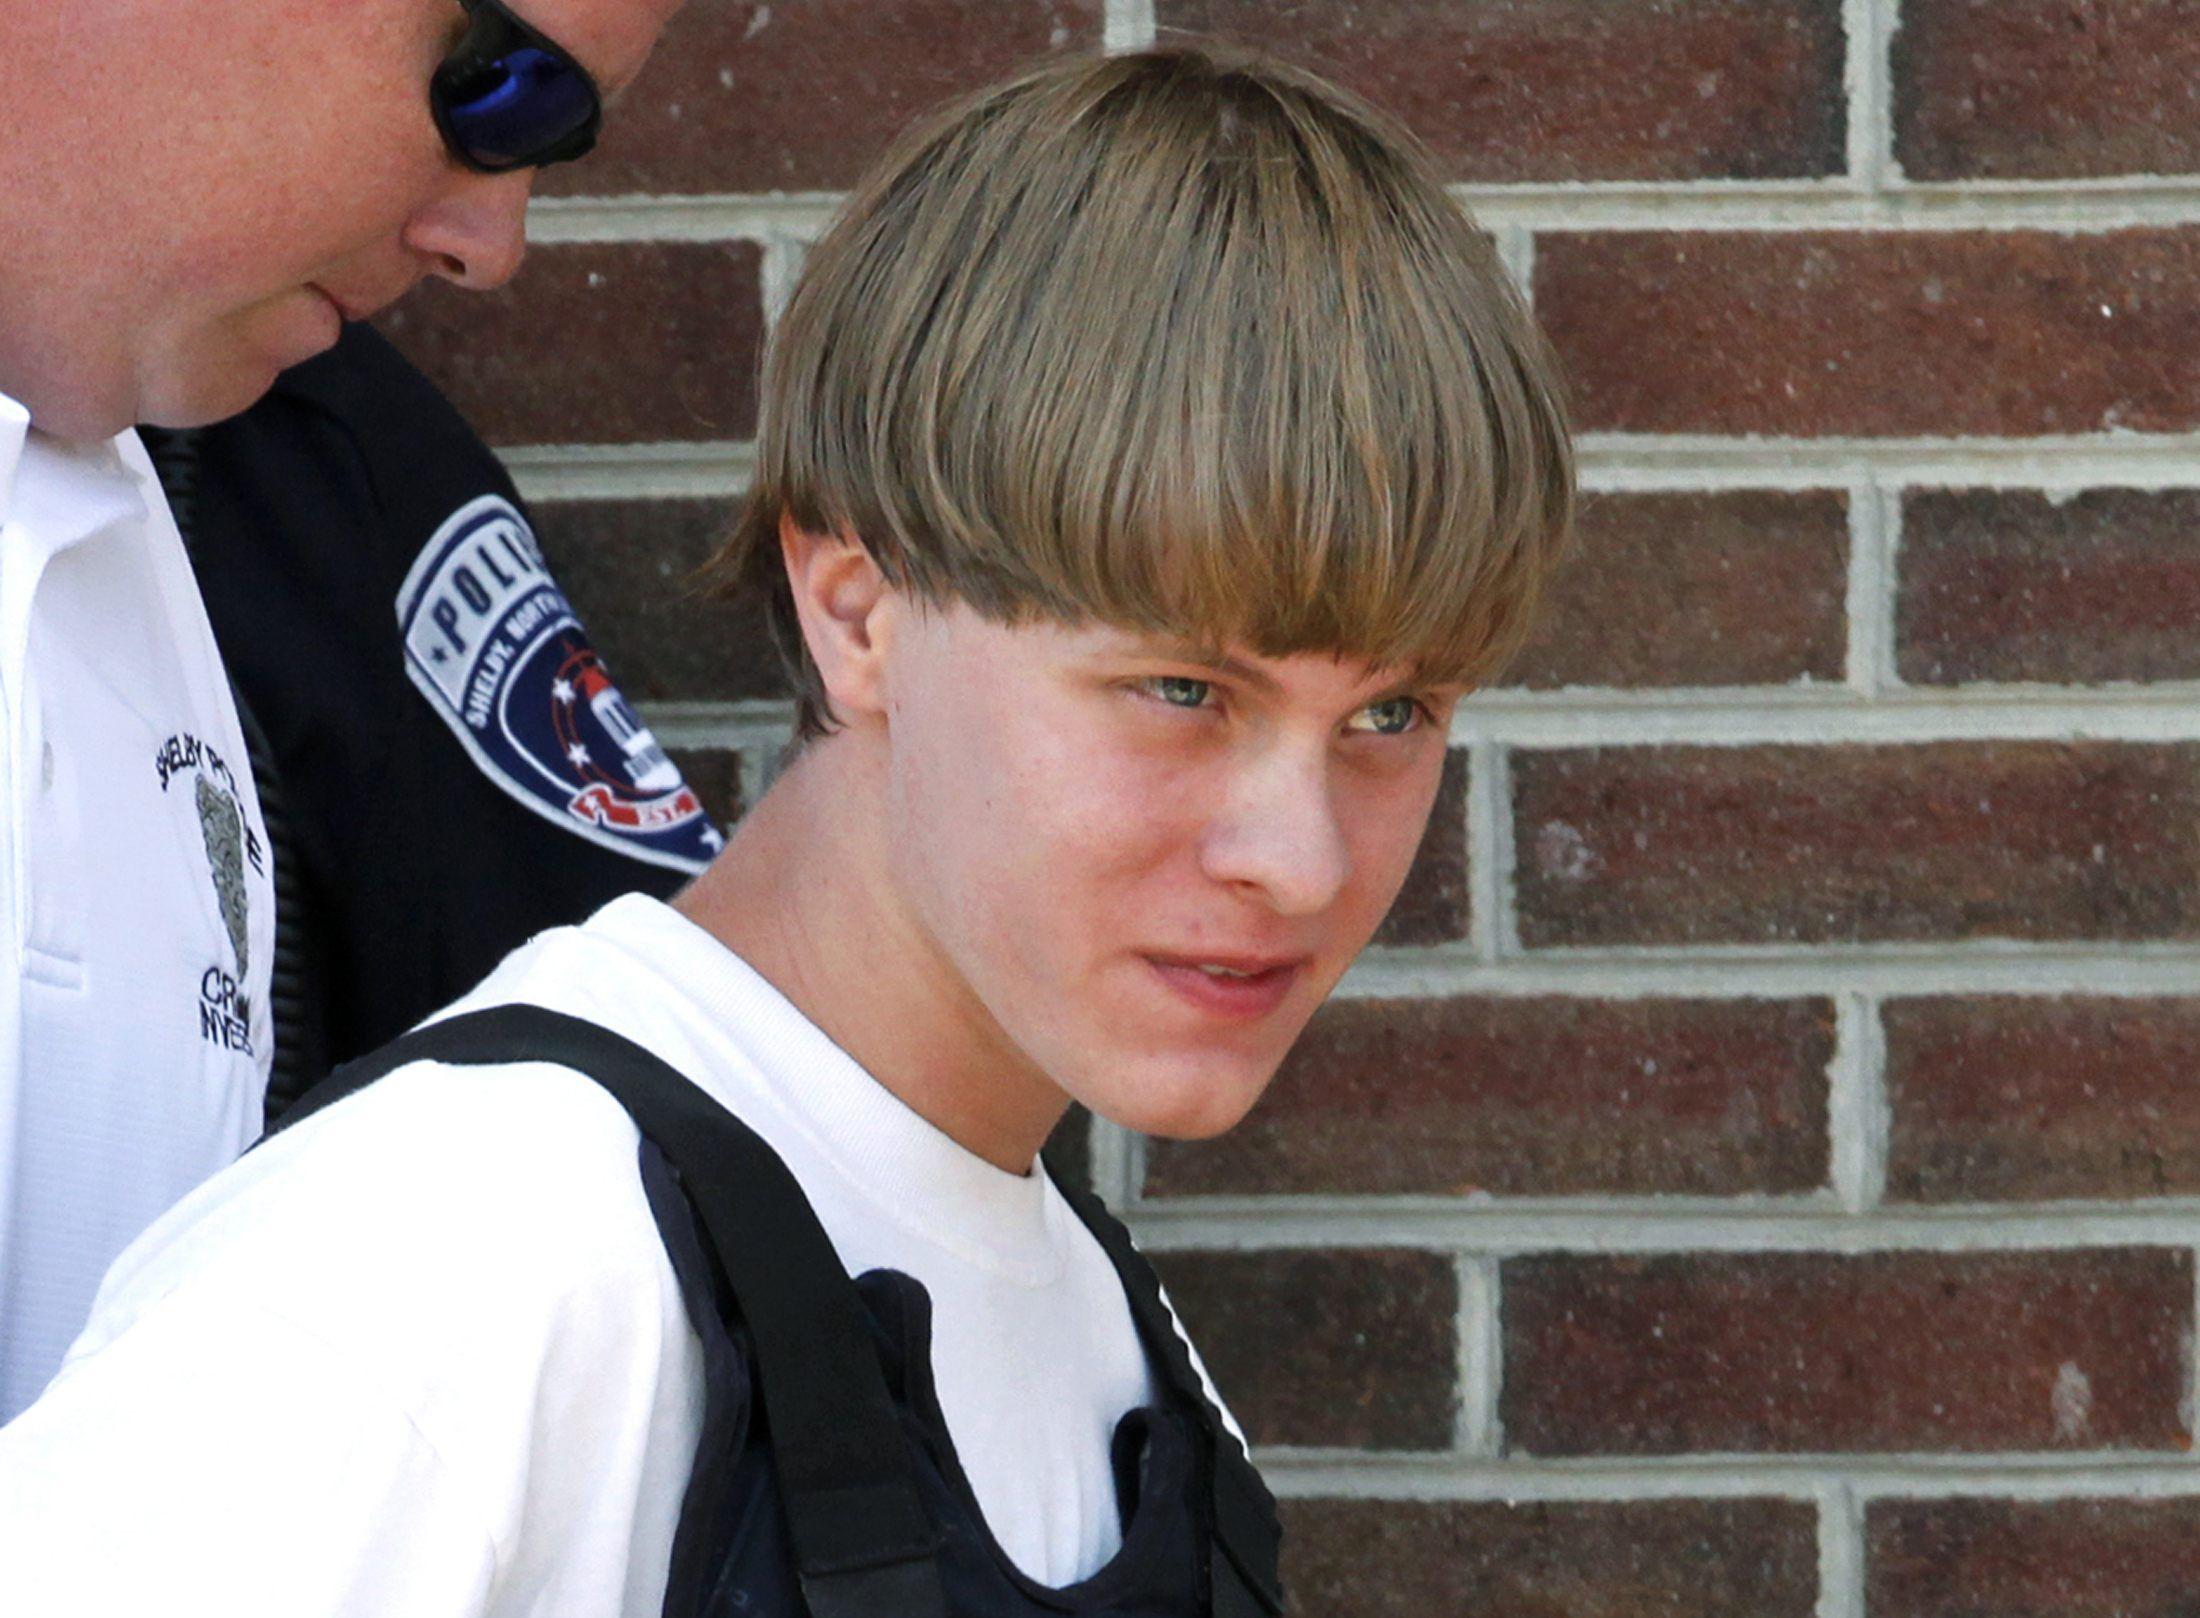 Photo of dylann Roof under arrest